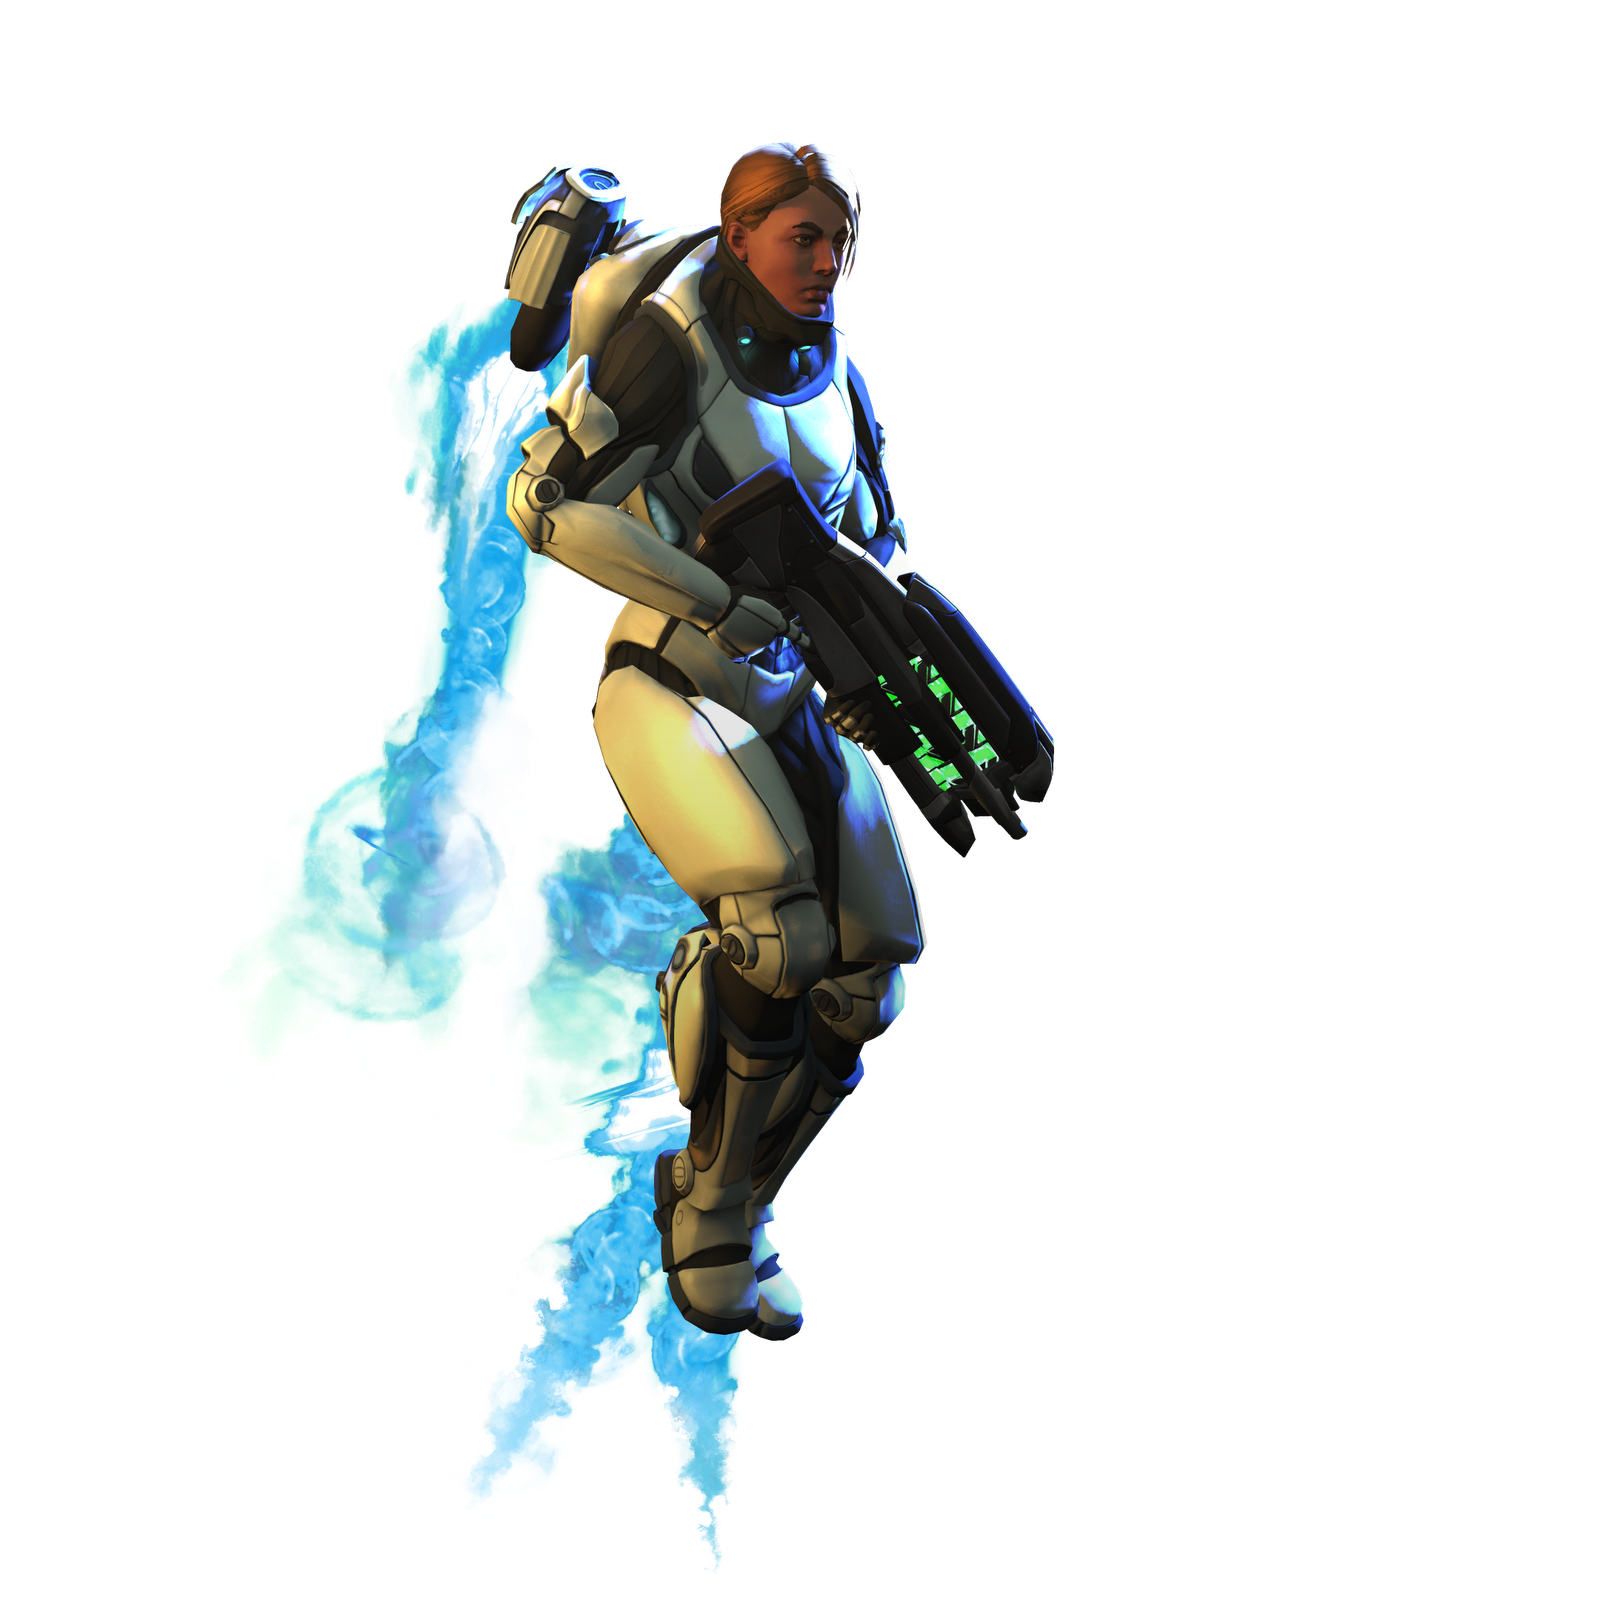 XCOM PNG Transparent Images.